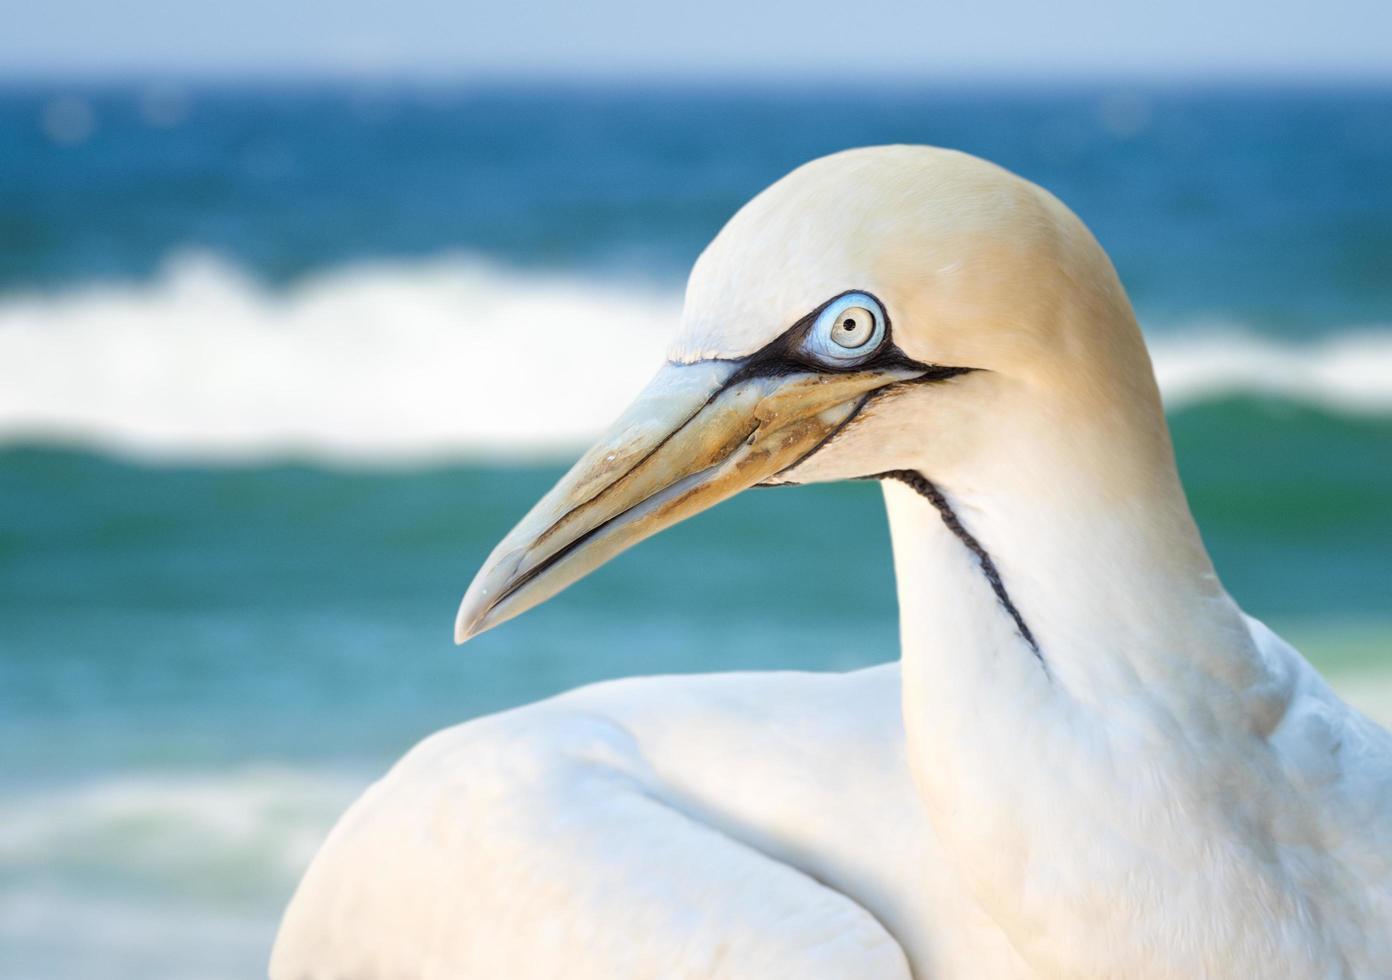 Close-up of albatross bird photo